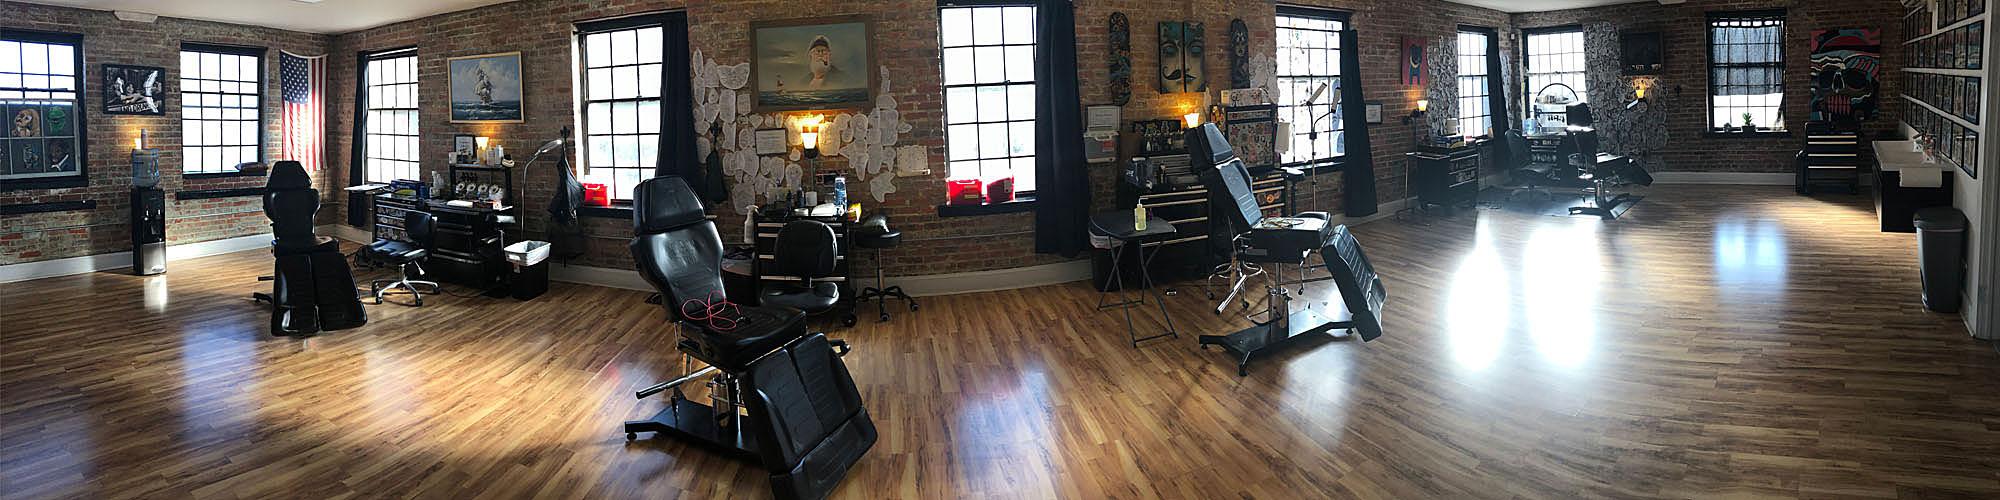 Good Graces Tattoo Studio